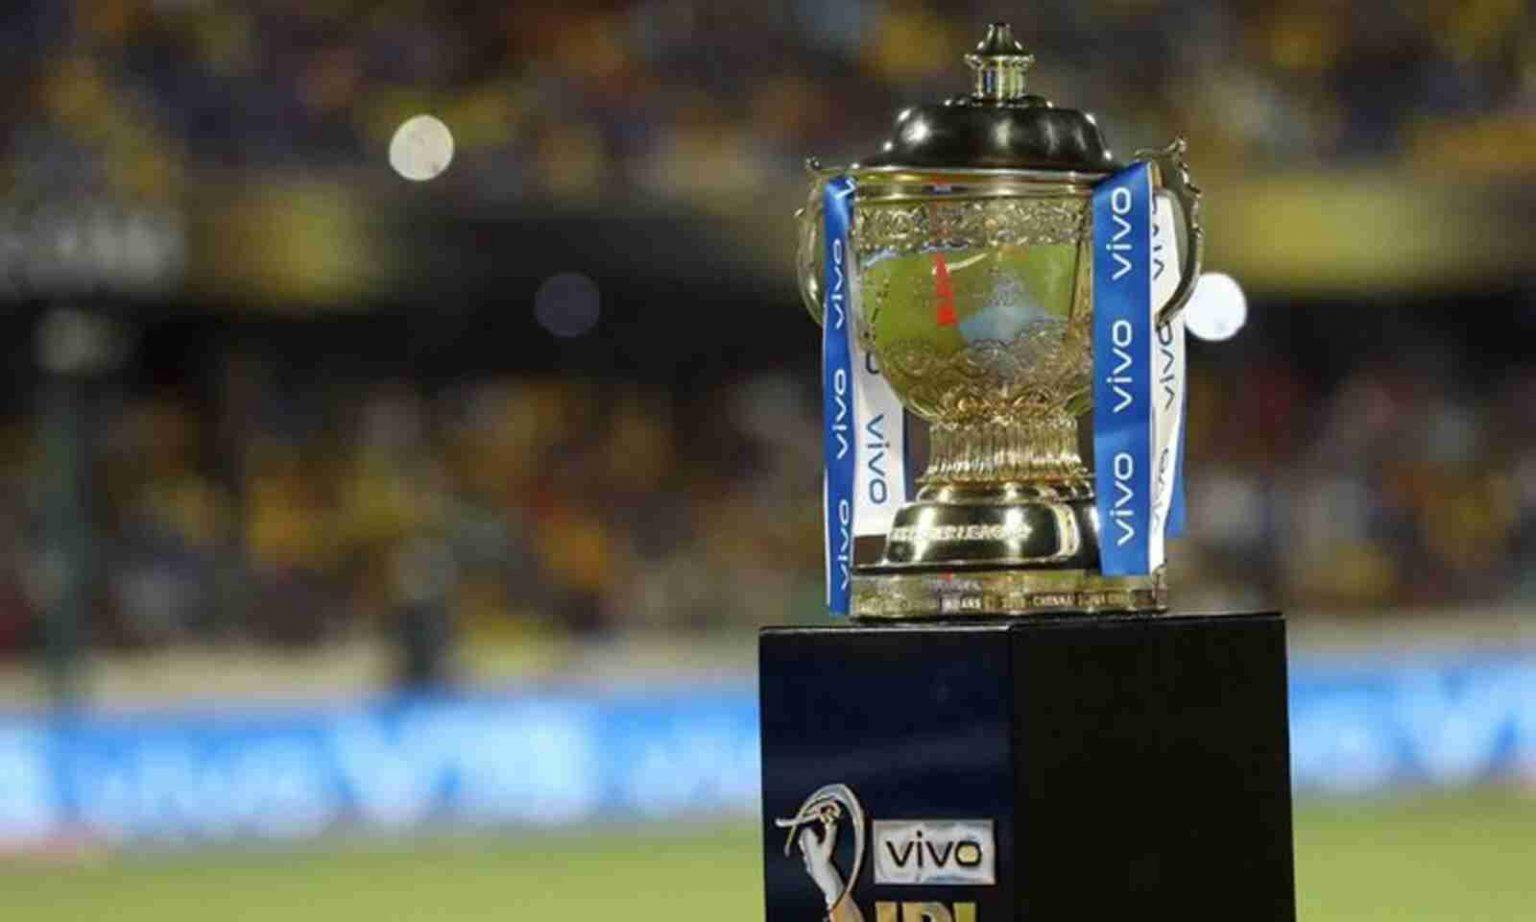 IPL 2021 to resume in the UAE in September-October | ഐപിഎൽ 2021 സെപ്റ്റംബർ-ഒക്ടോബർ മാസങ്ങളിൽ യുഎഇയിൽ പുനരാരംഭിക്കും_40.1